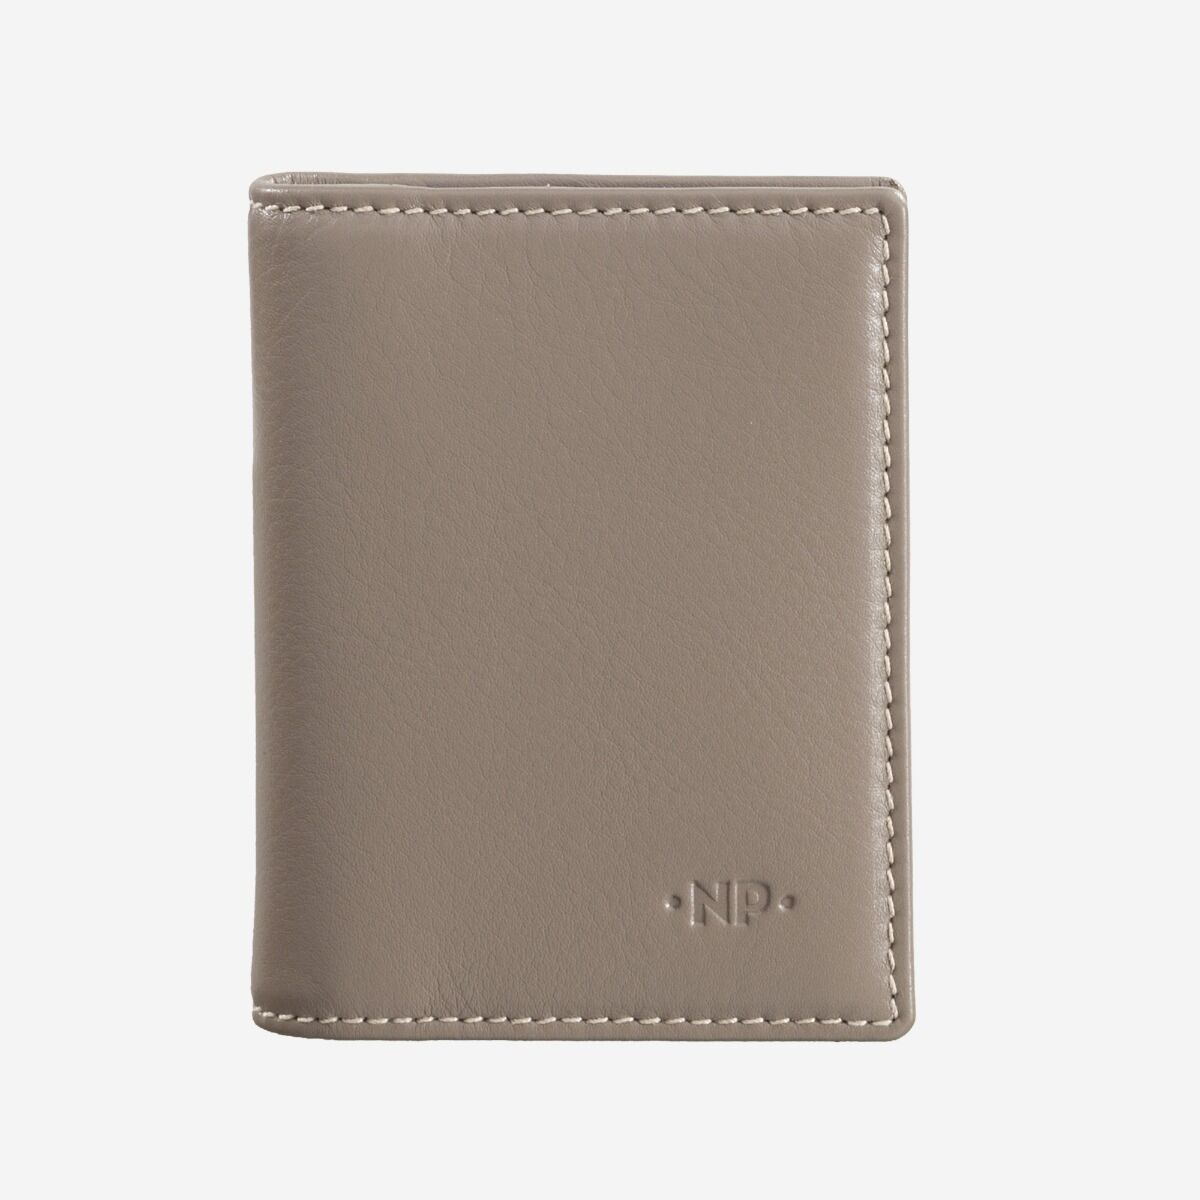 Kreditkartenetui aus schwarzem Leder